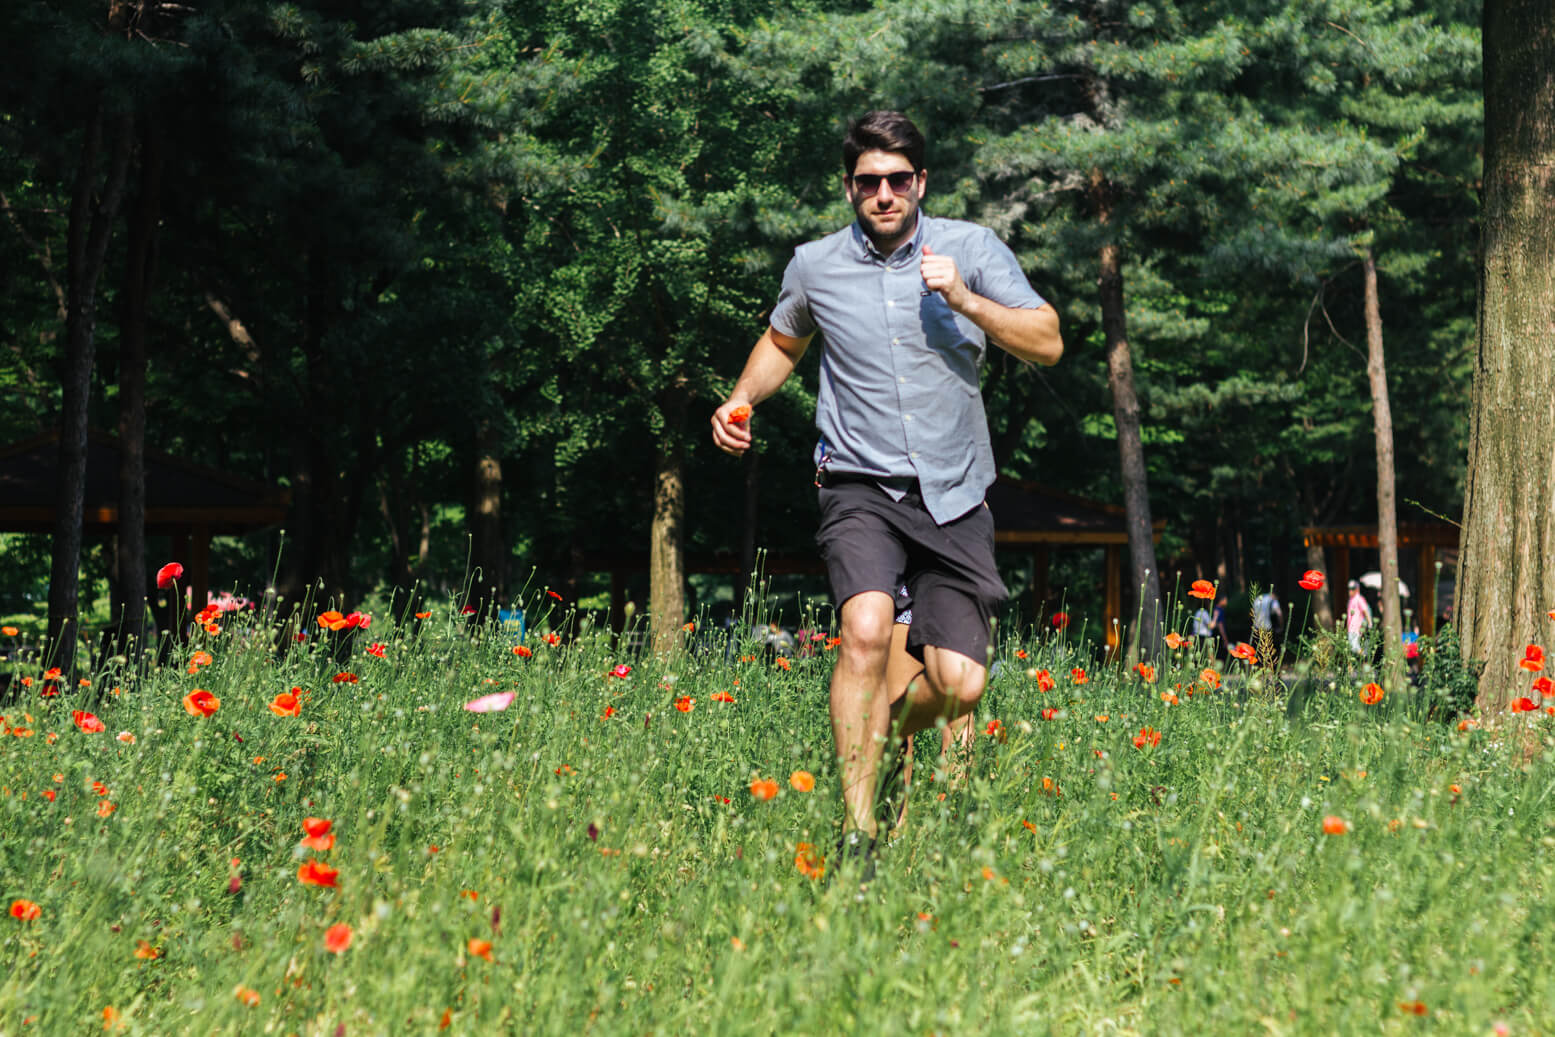 Scott running at Grand Seoul Park